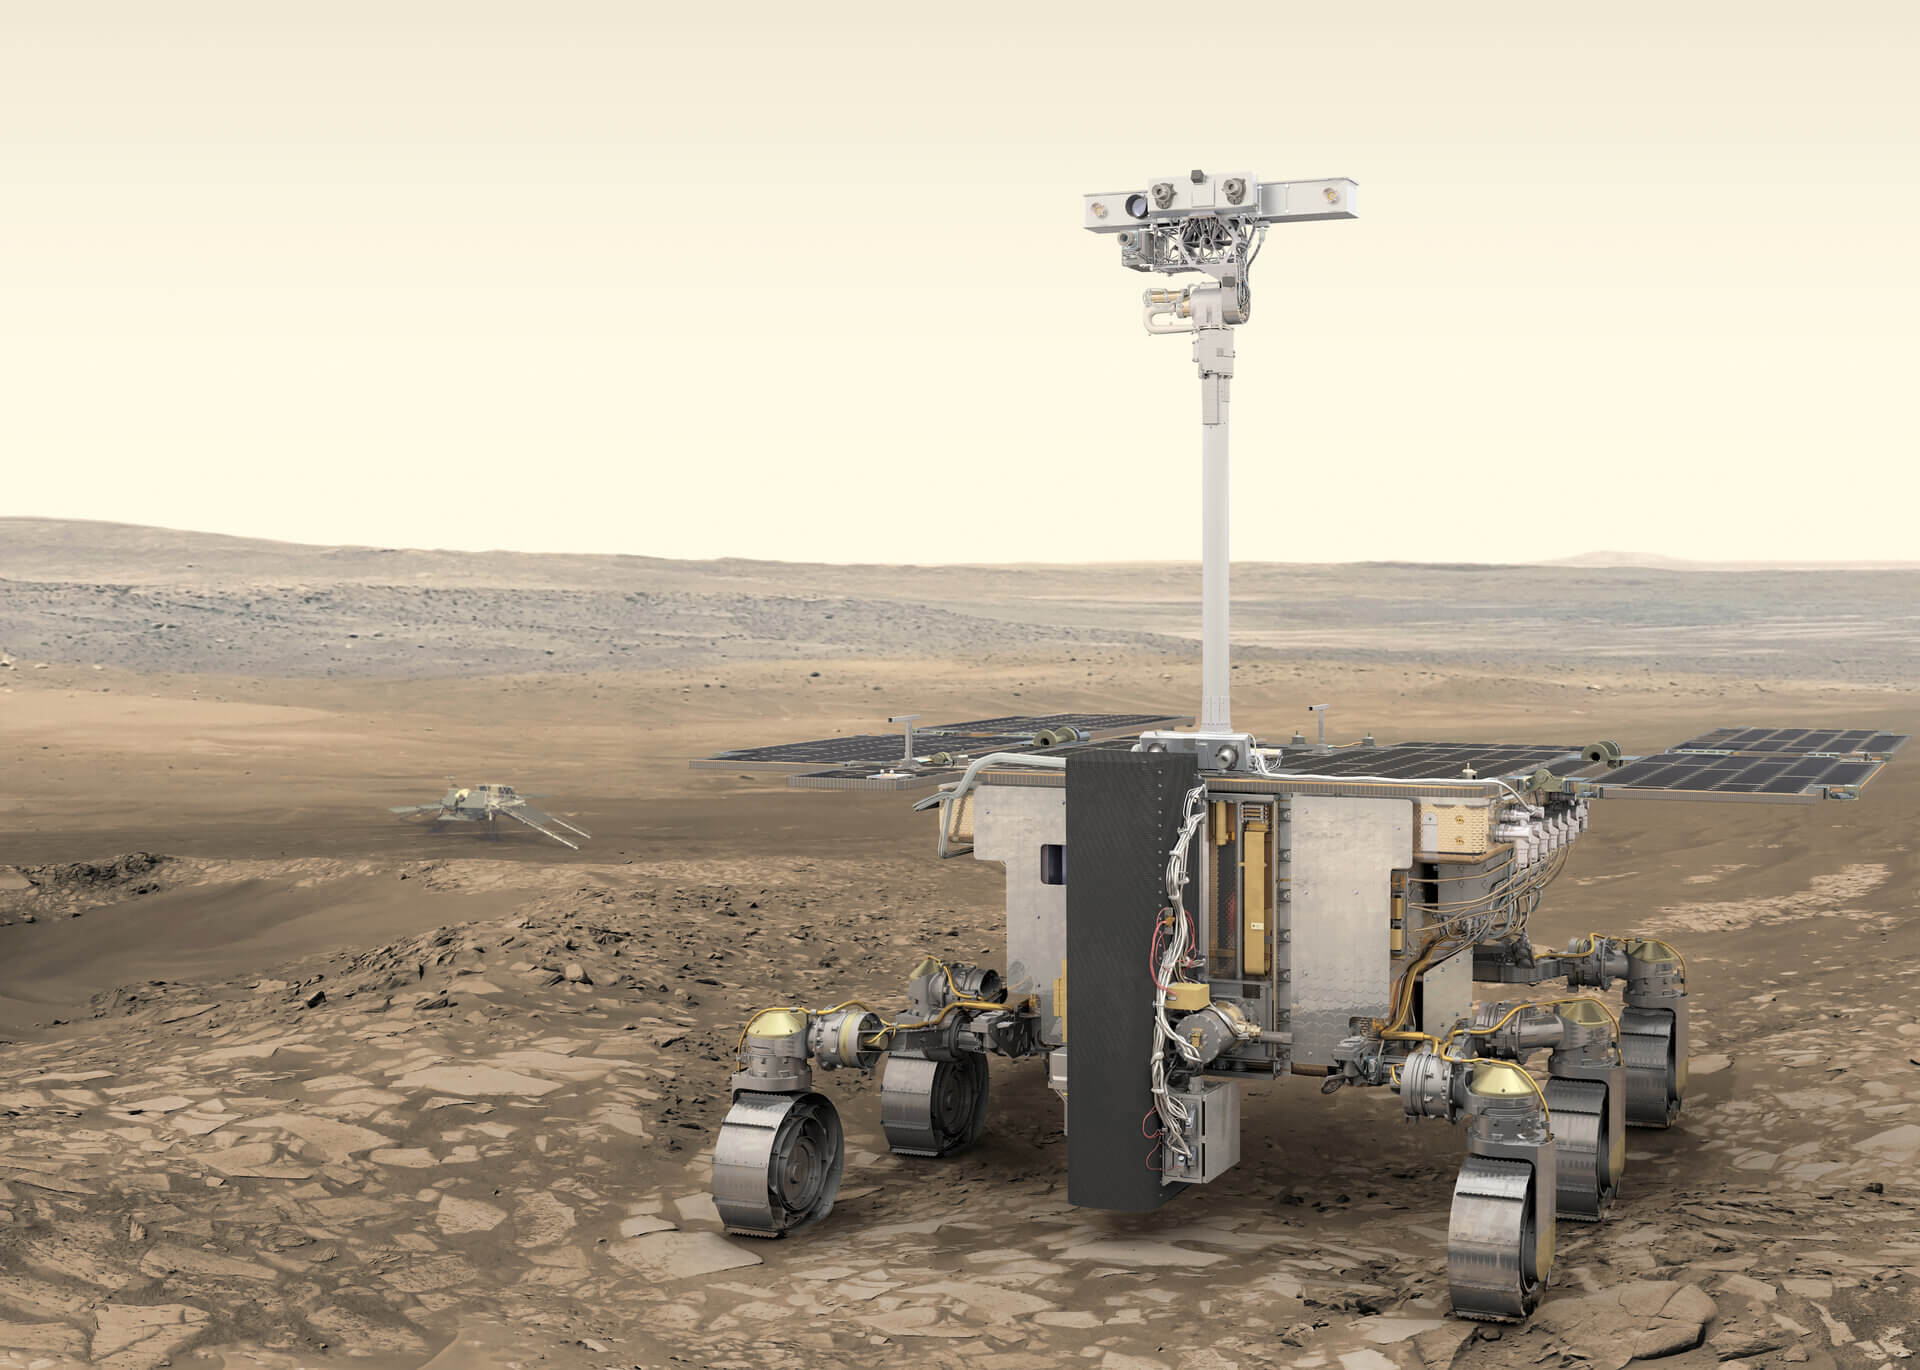 La ESA pospone la misión ExoMars hasta 2022